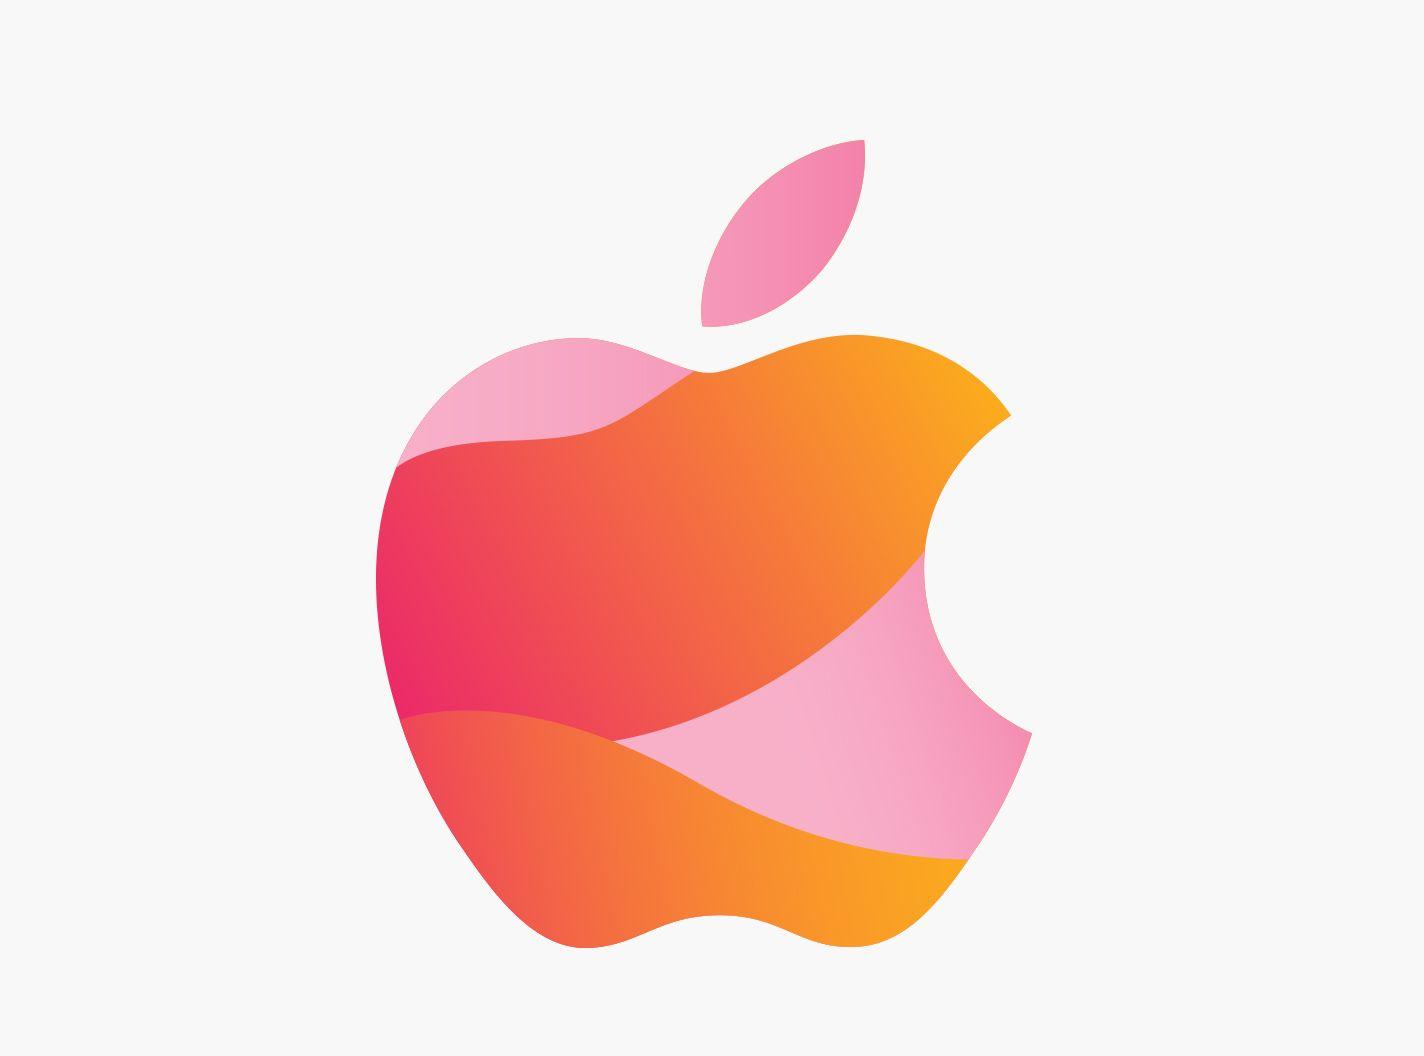 Pin By Raj Rao On Branding Apple Wallpaper Iphone Apple Logo Apple Wallpaper